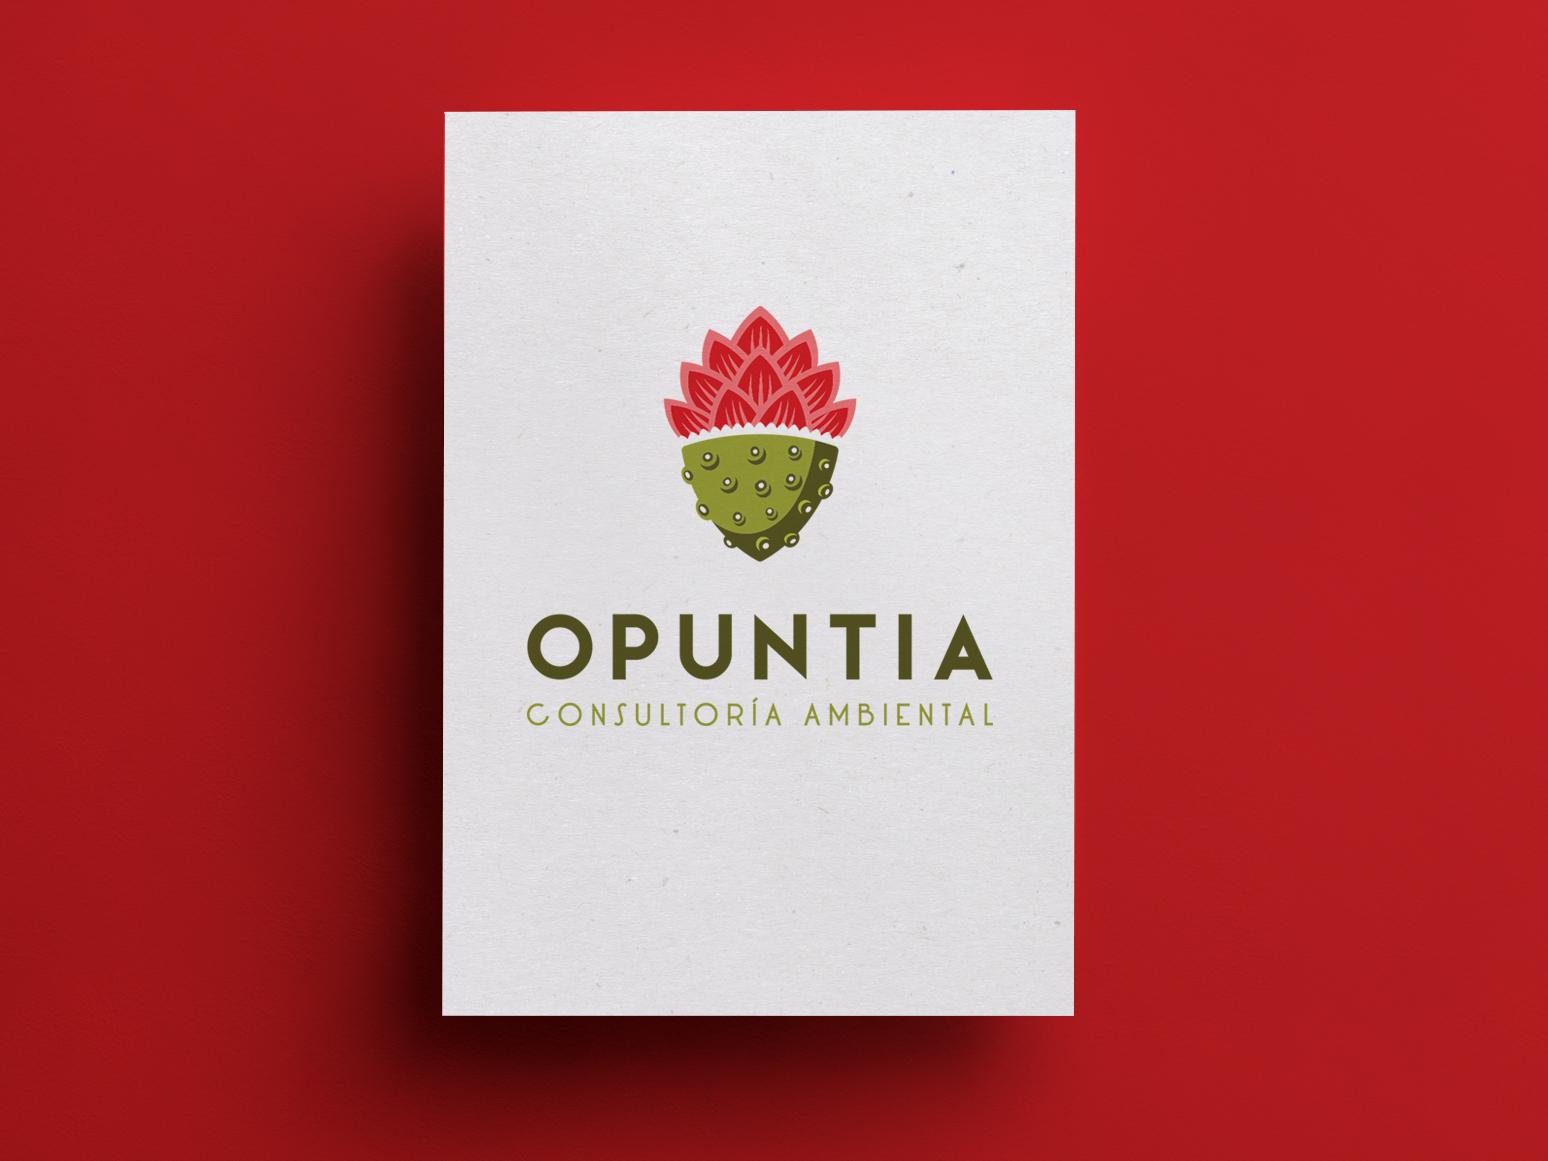 Opuntia business card identity branding brand branding agency branding branding design logotype aurea carmin design studio logodesign business card design businesscard